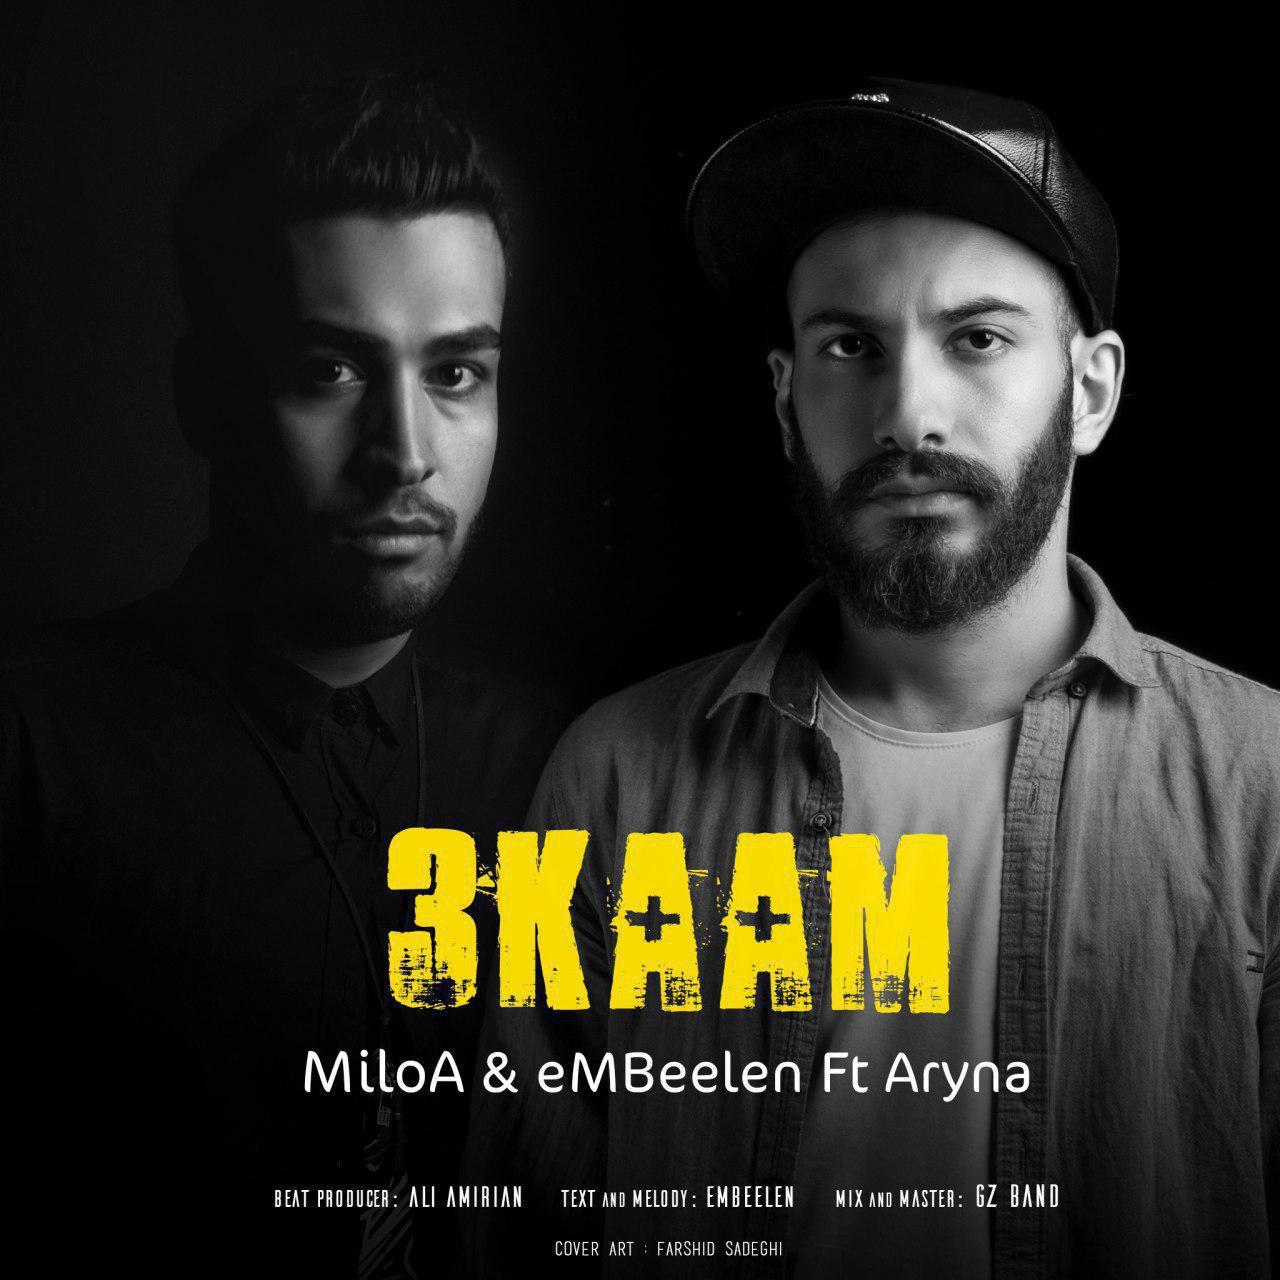 MiloA And eMBeelen – 3Kaam (Ft Aryana)